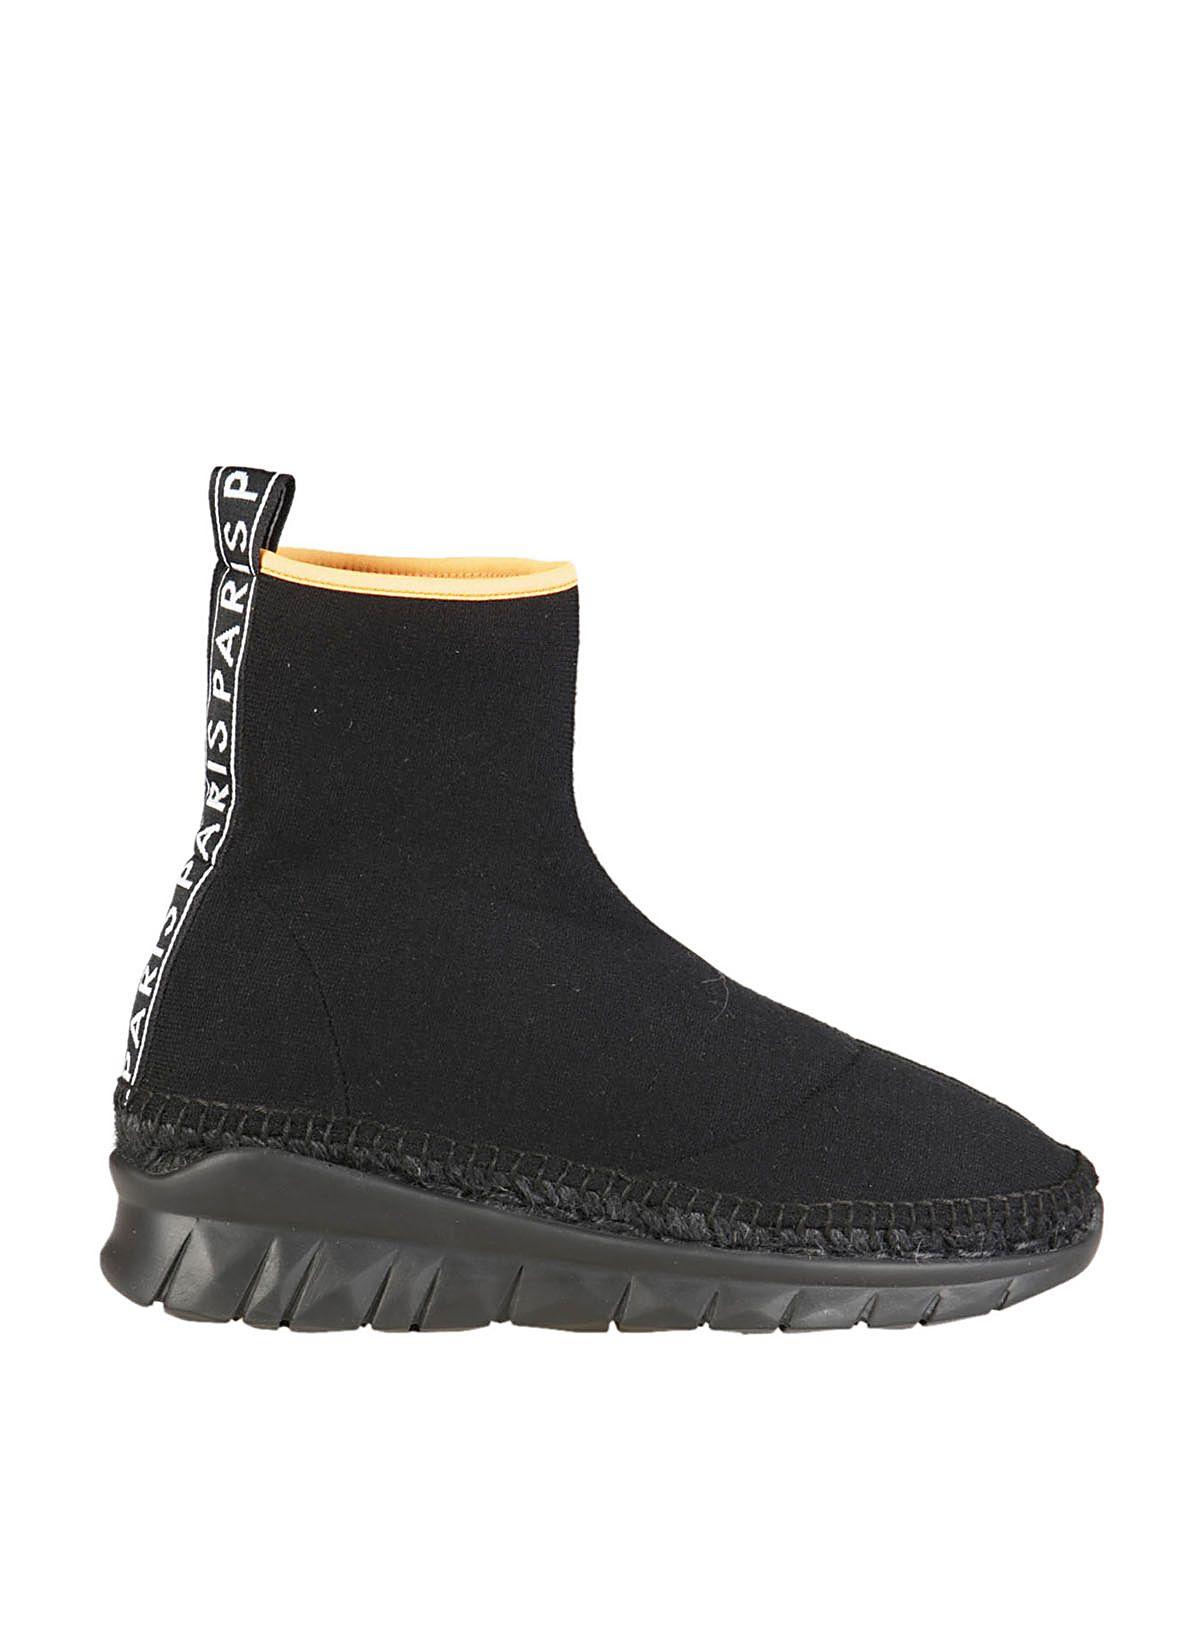 Kenzo-k Lastic Sock Sneakers